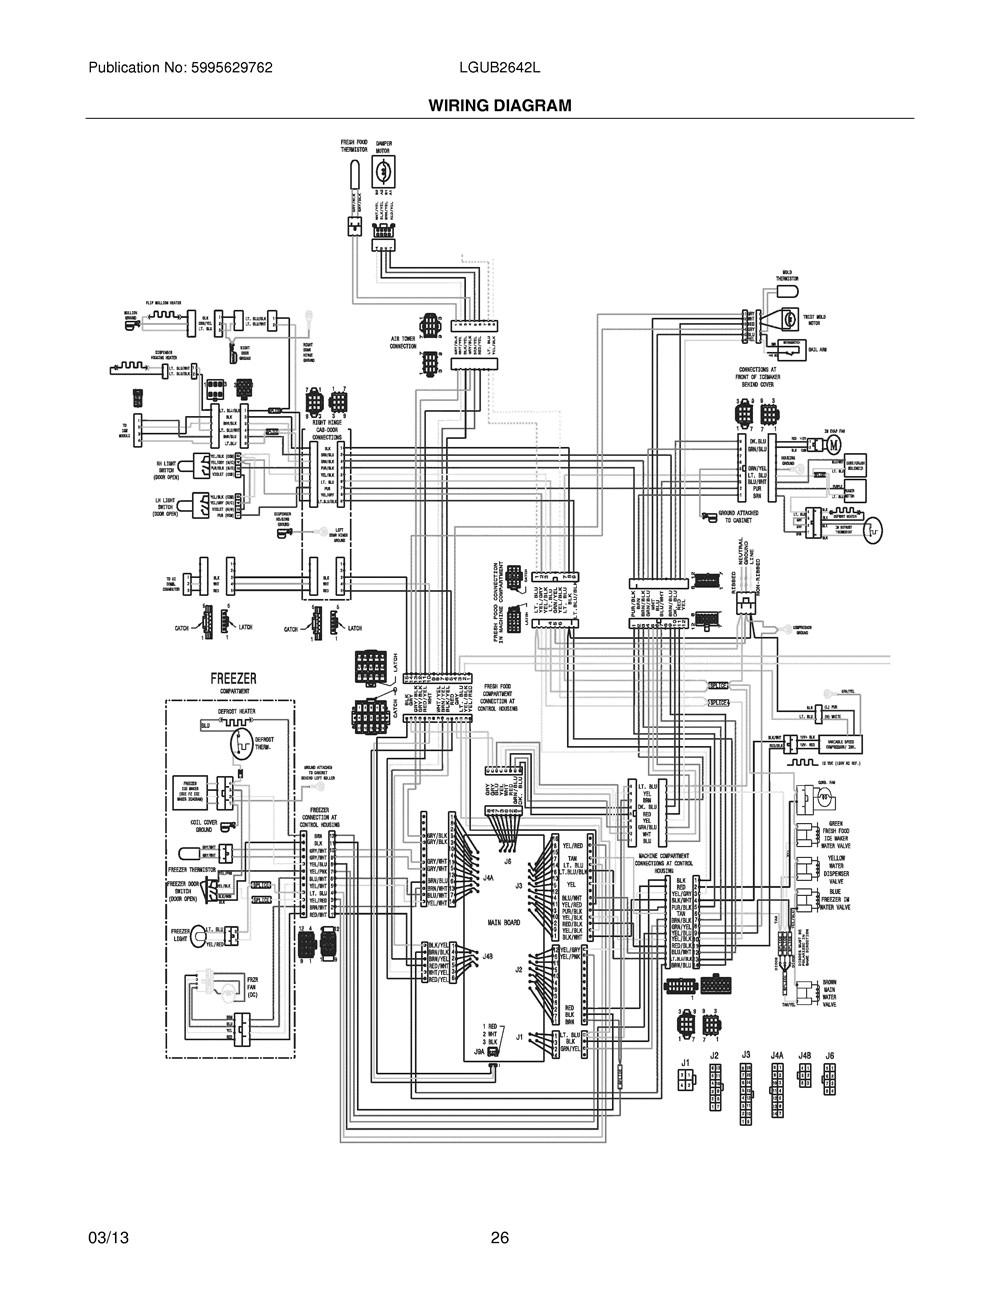 Toyota Quantum Fuse Box Daily Update Wiring Diagram Granvia Honda Beat Injeksi Images D4d